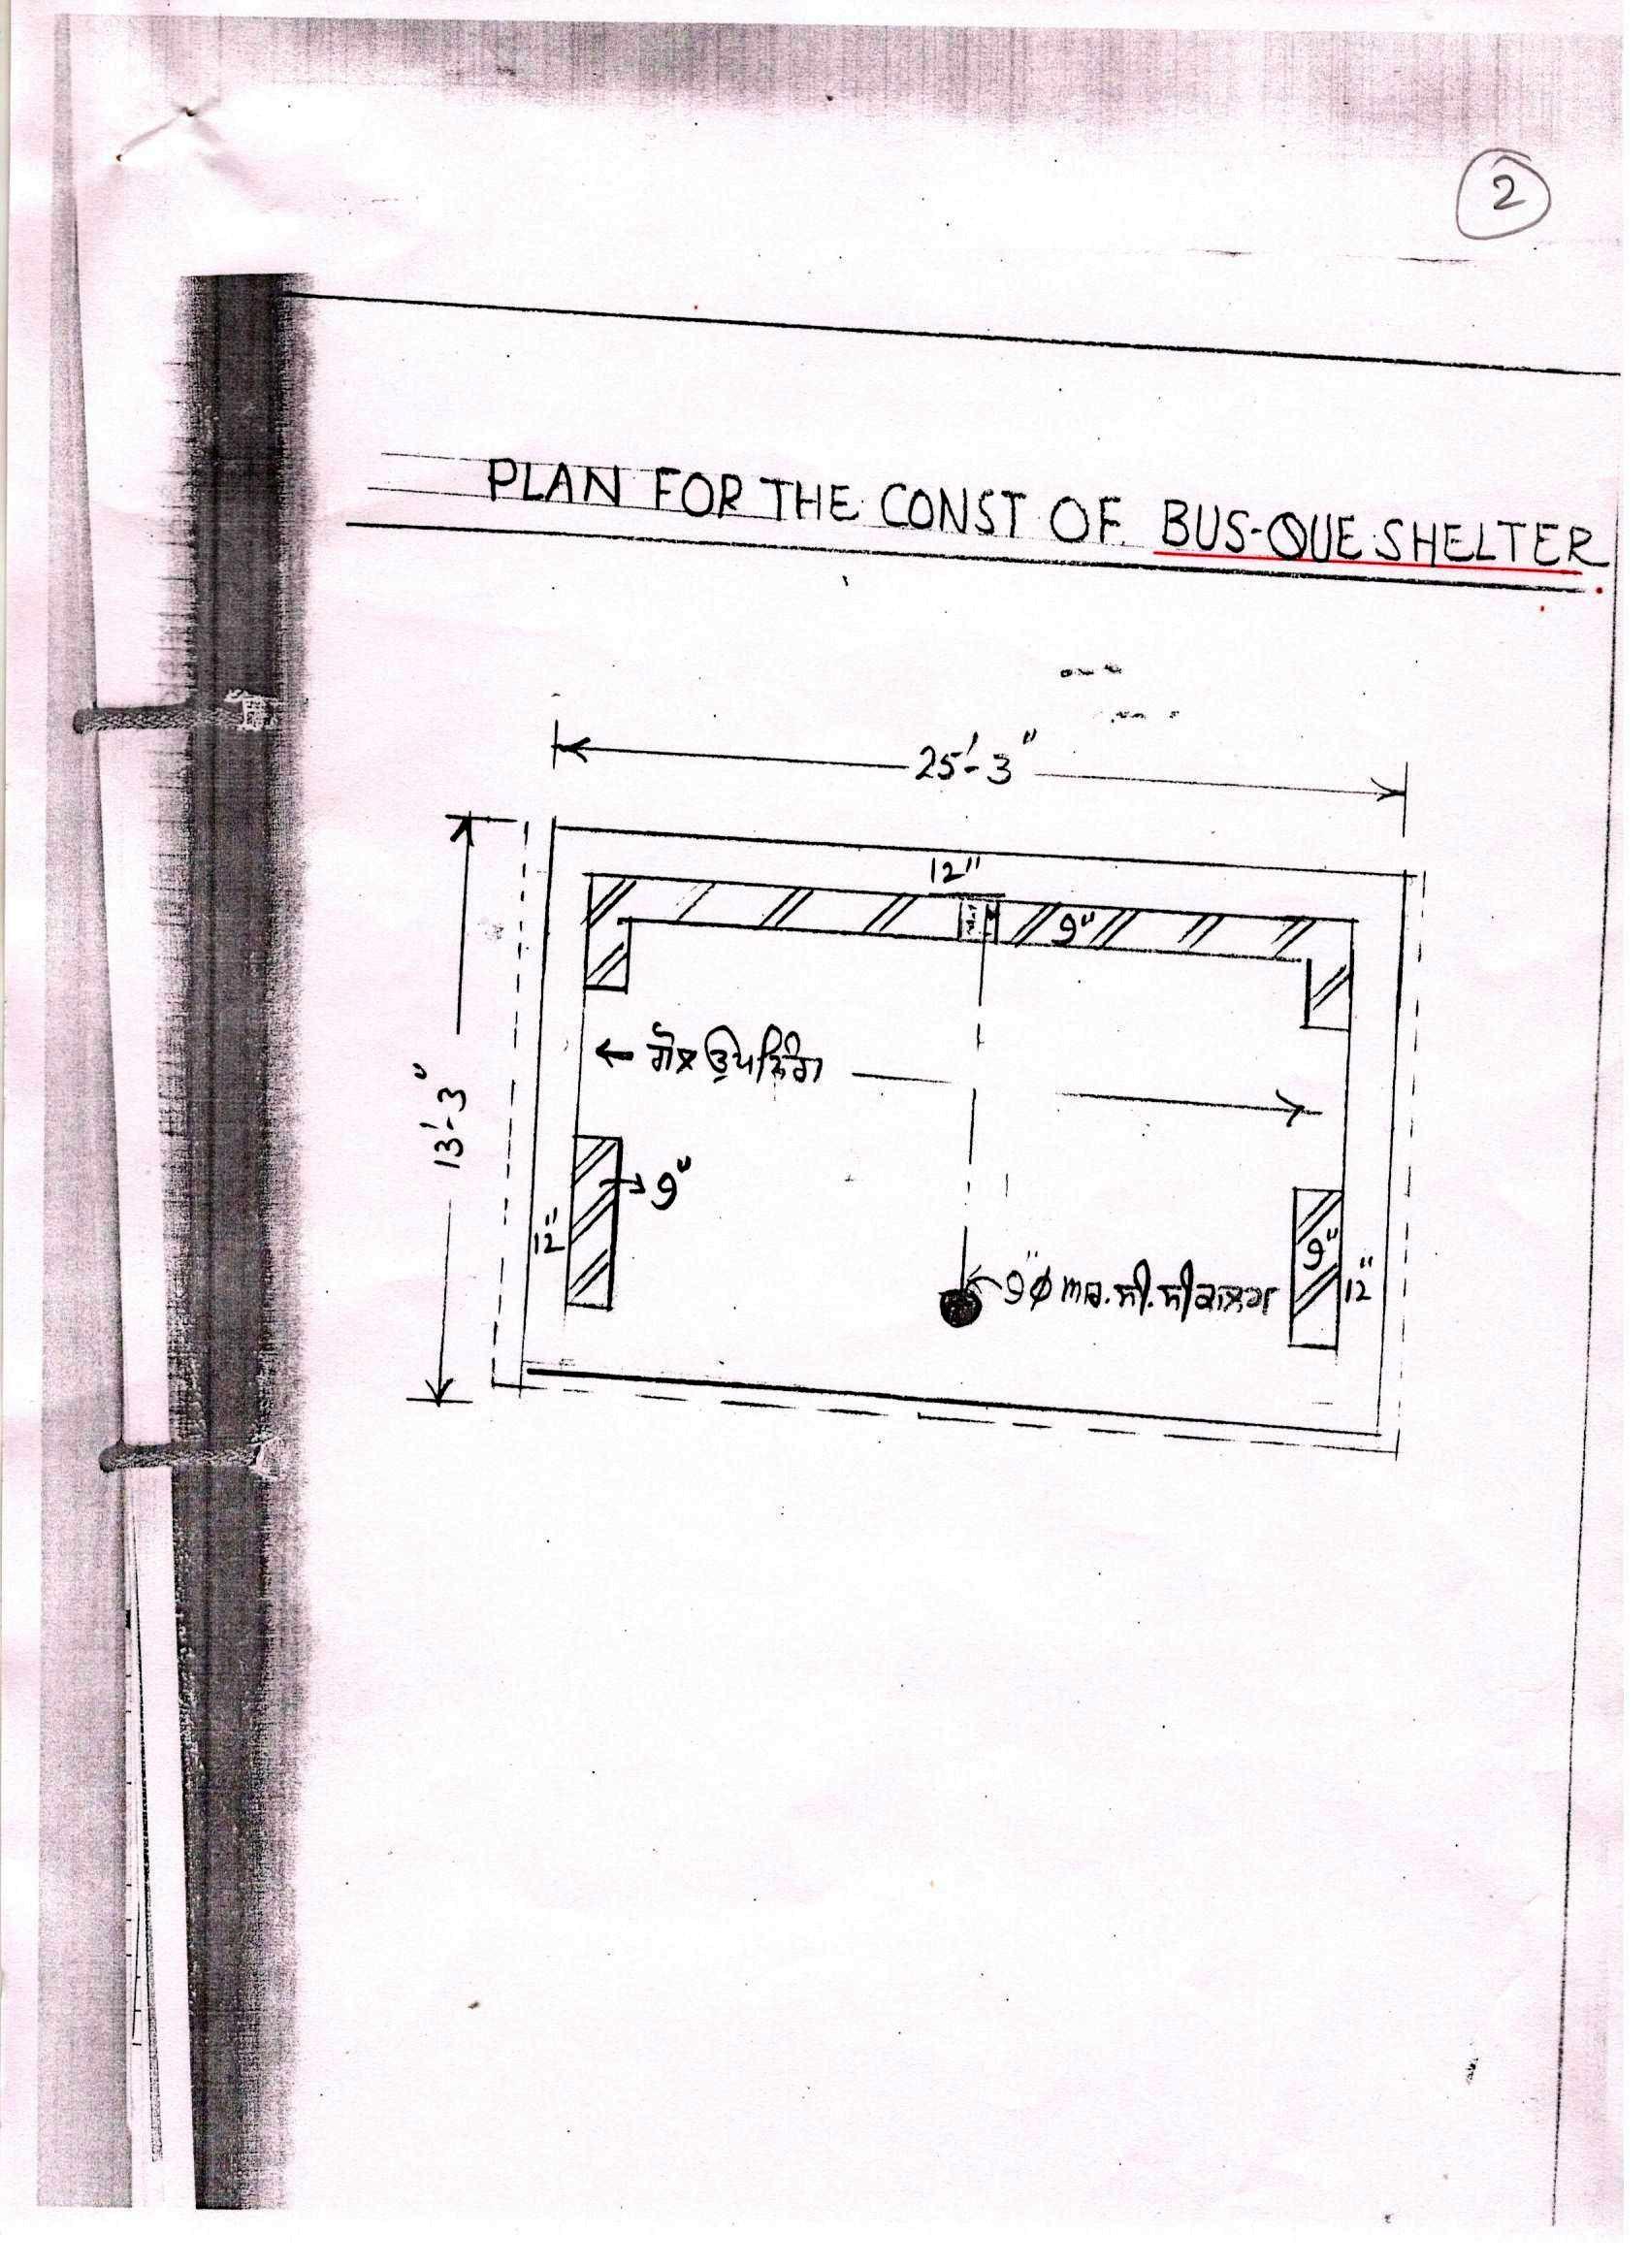 1700x2338 Department Of Rural Development And Panchayats, Punjab